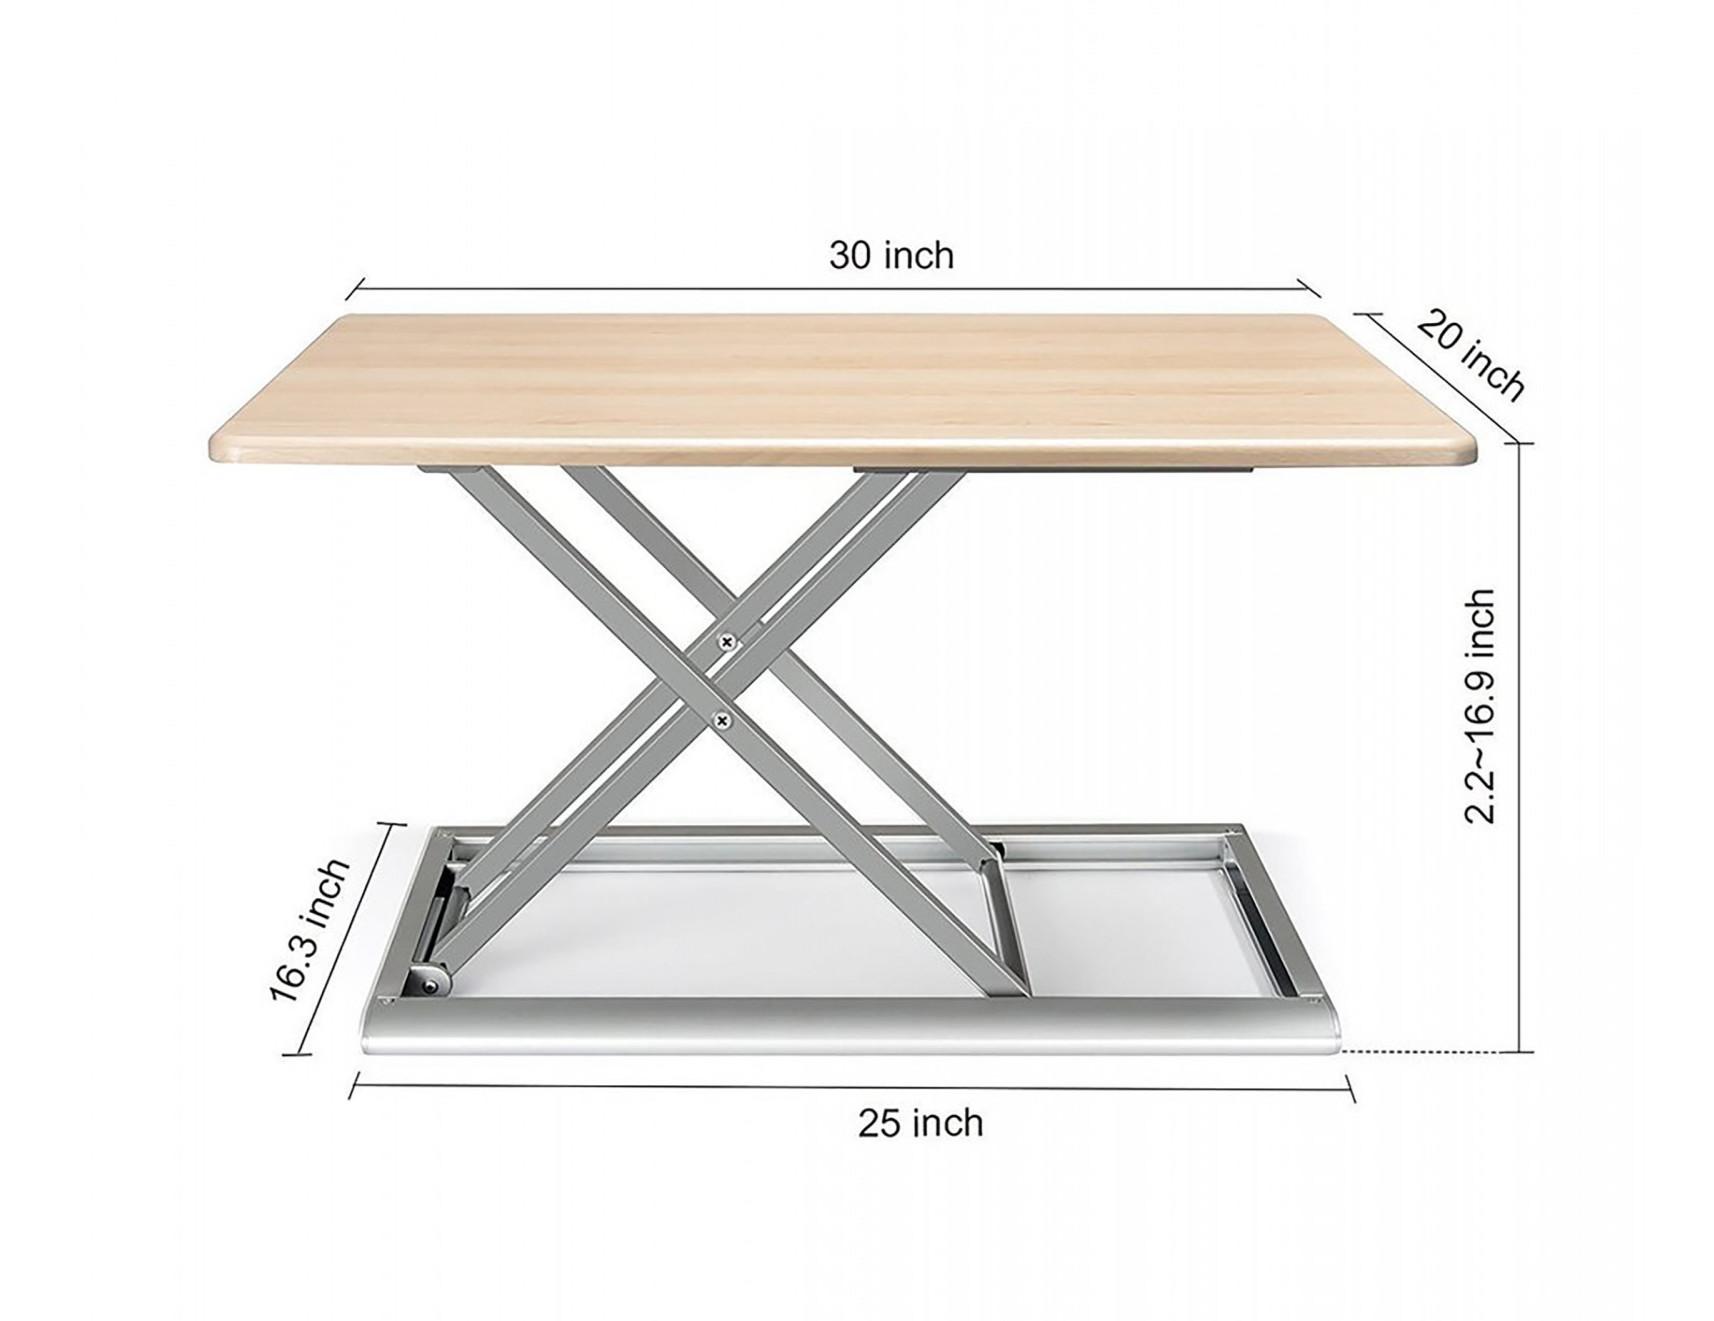 x-flextop portable sit to stand desk dimensions